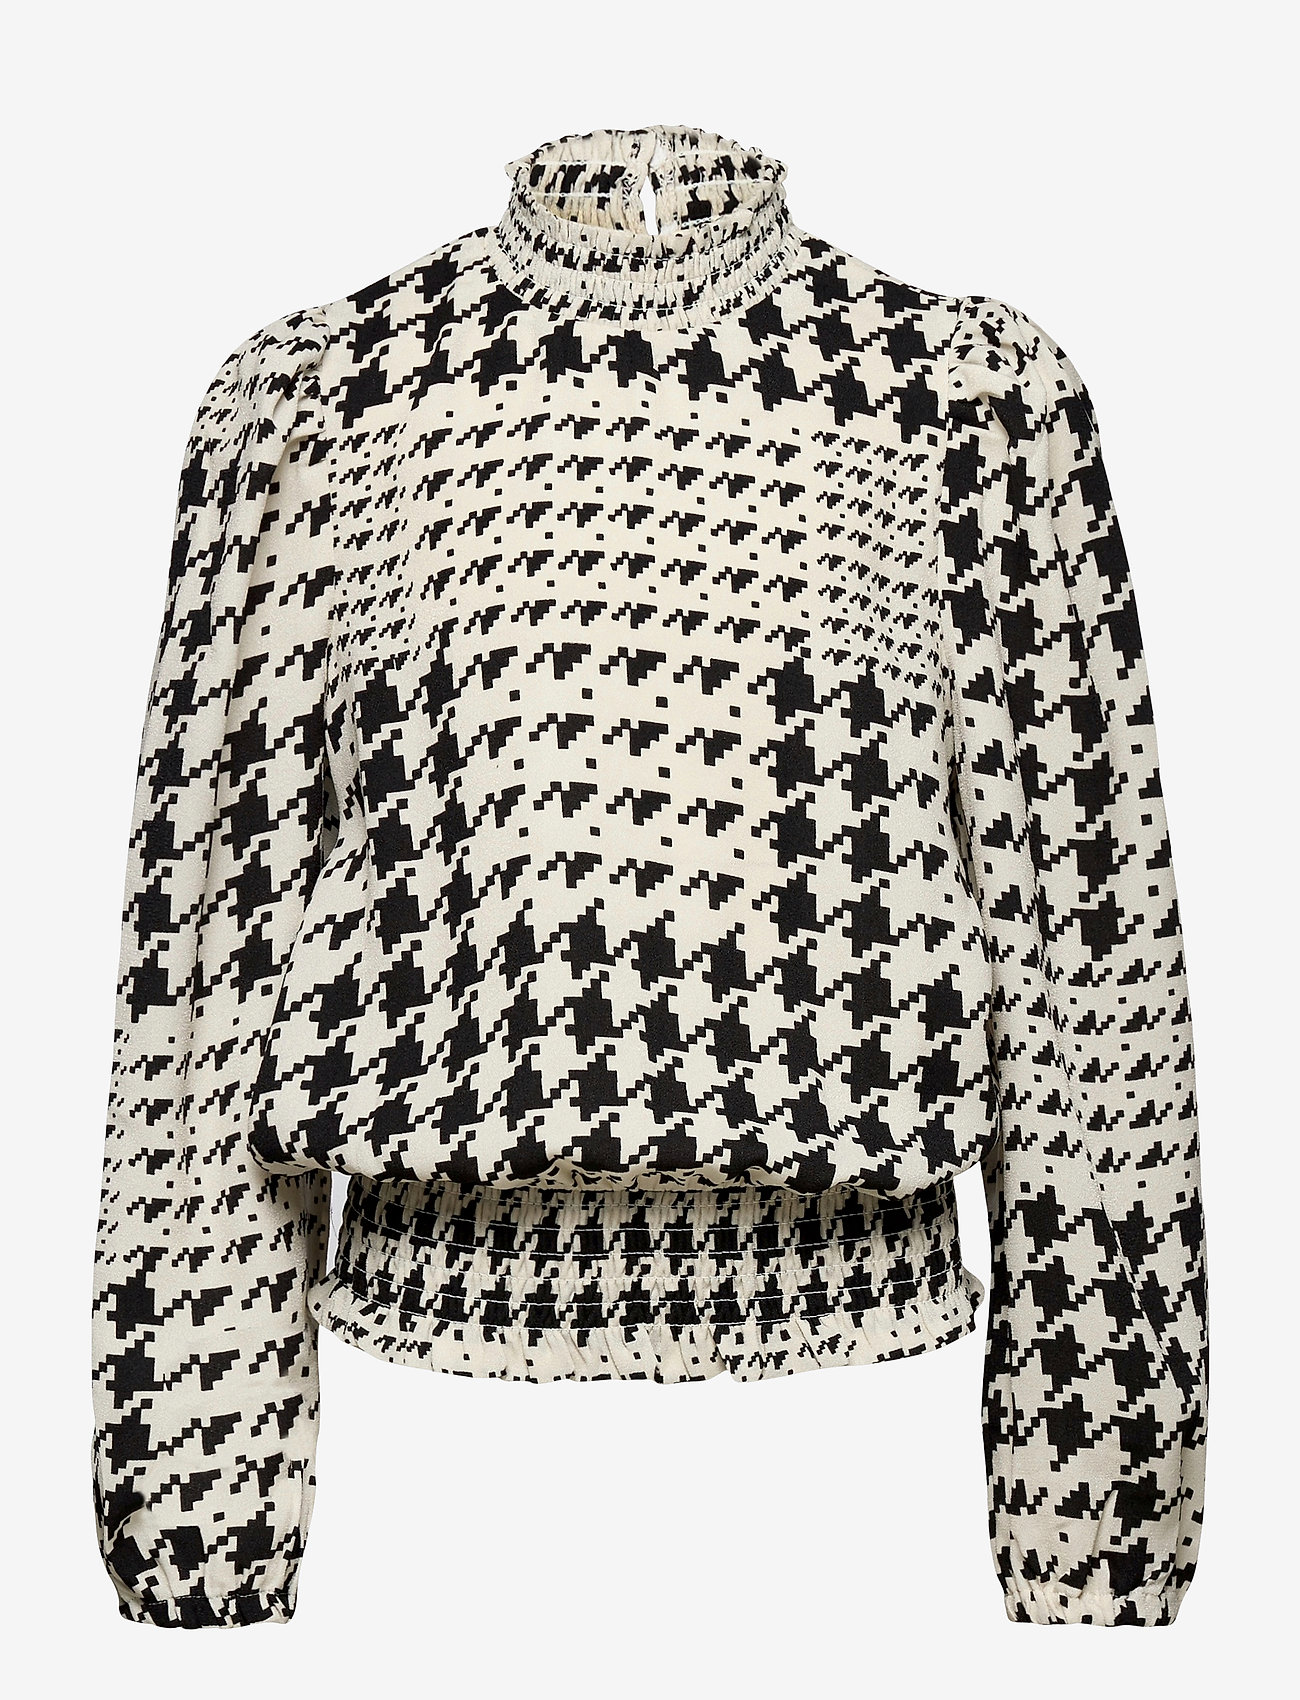 LMTD - NLFTOUND LS SHIRT - blouses & tunics - black - 0